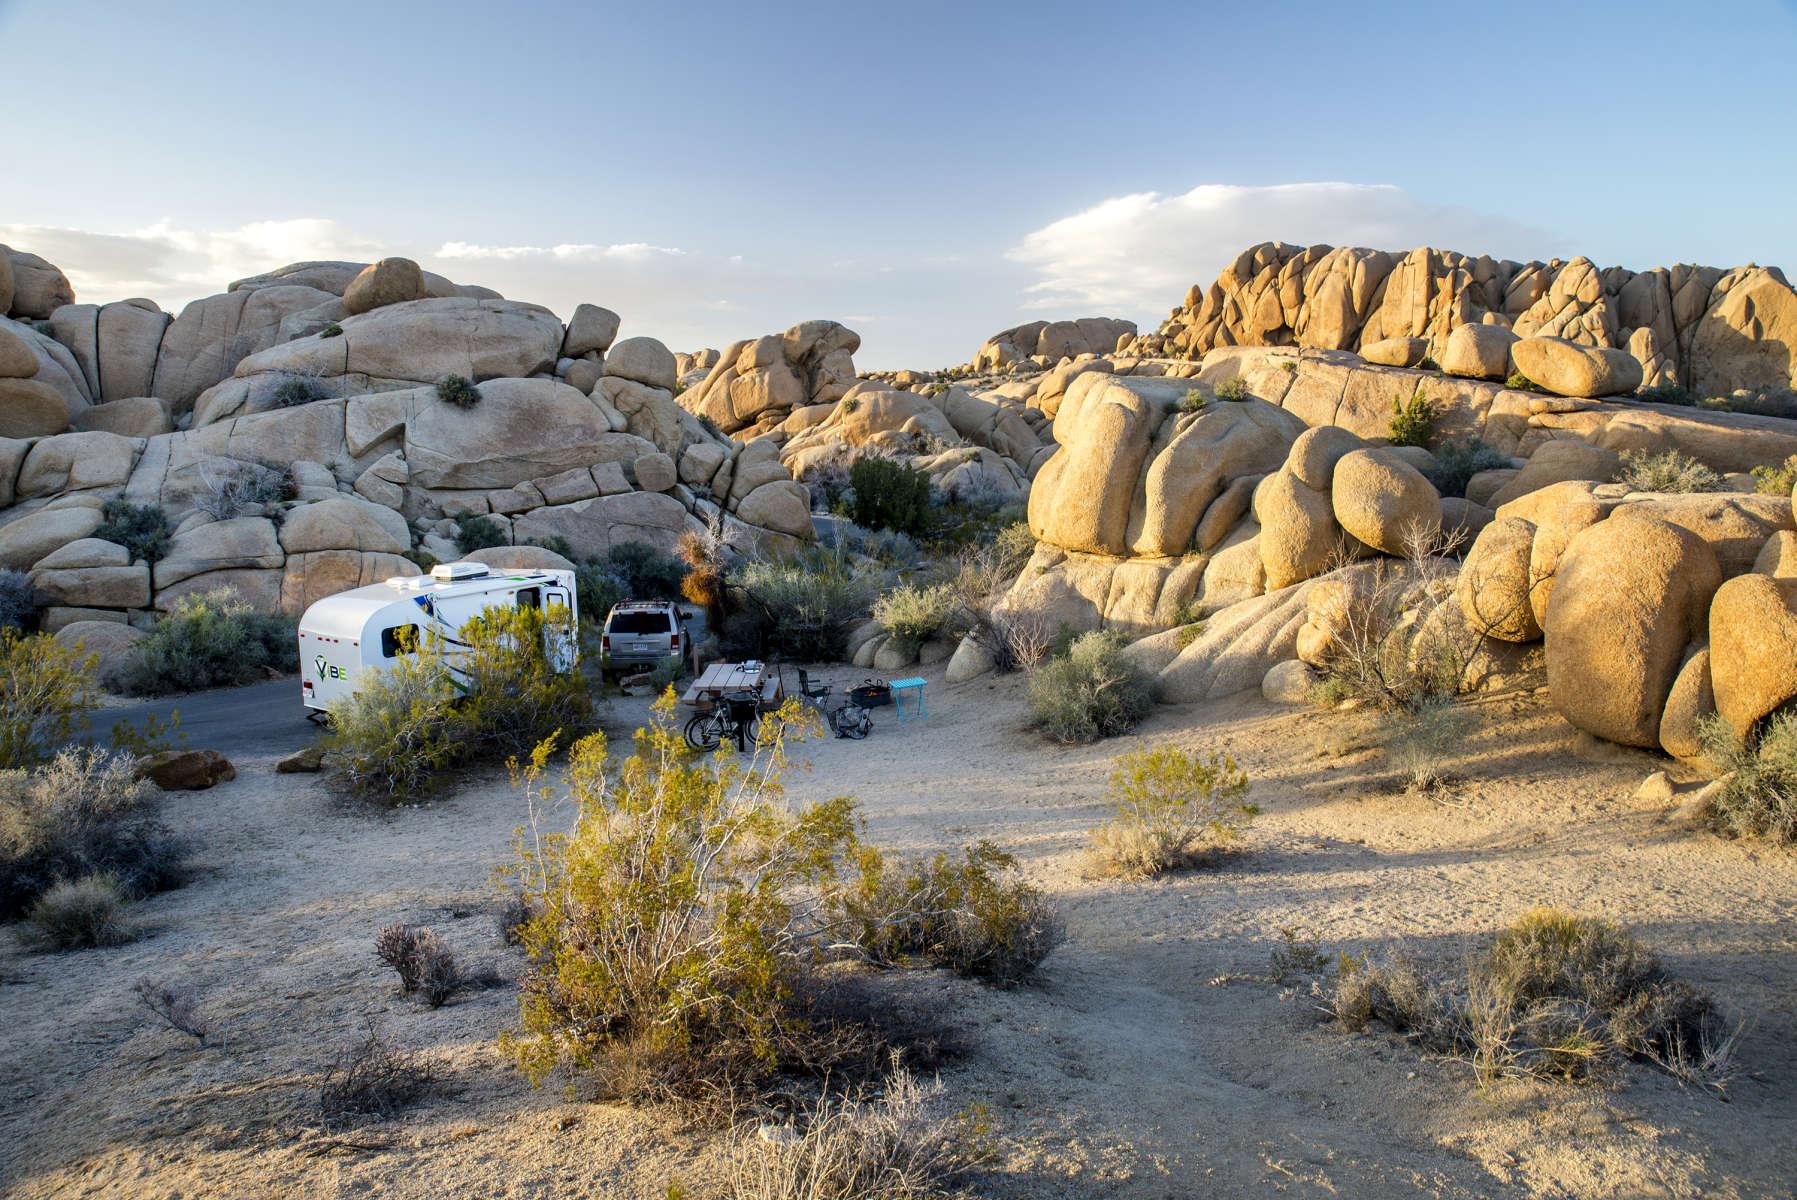 Jumbo Rocks Campground Joshua Tree Ca 54 Hipcamper Reviews And